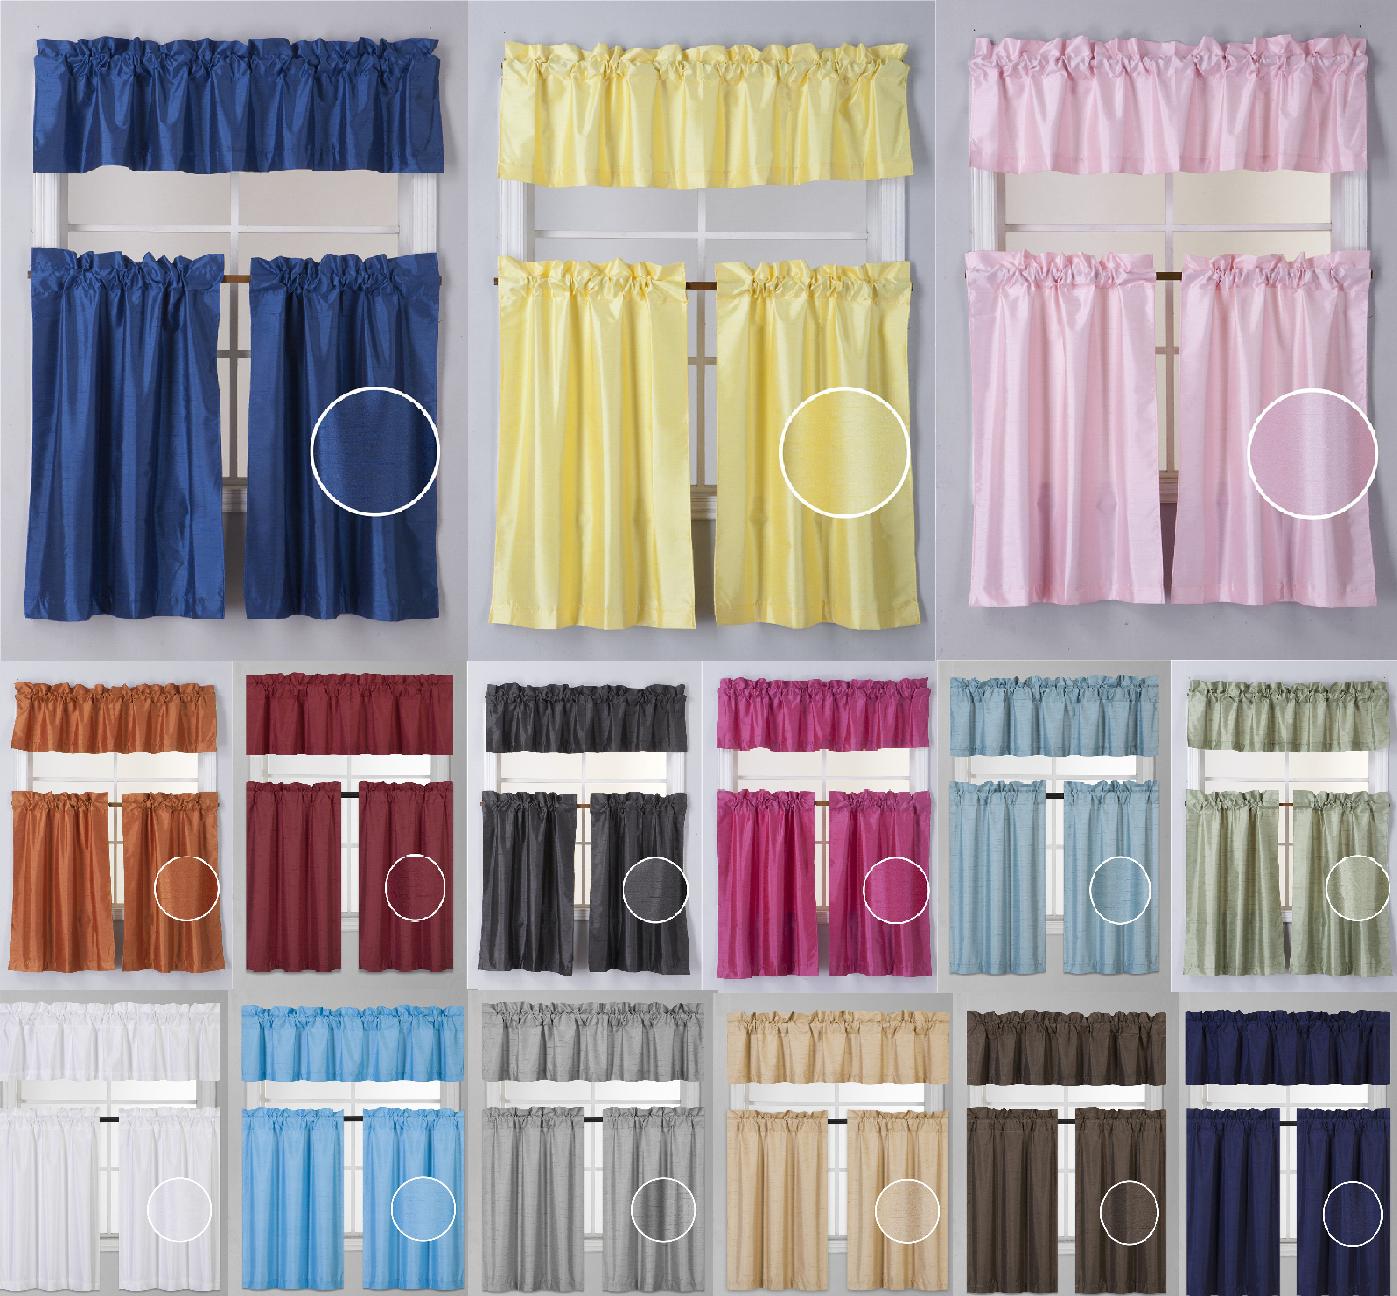 Small Window Valance Tier Faux Silk Panel Lined Drape 3PC S